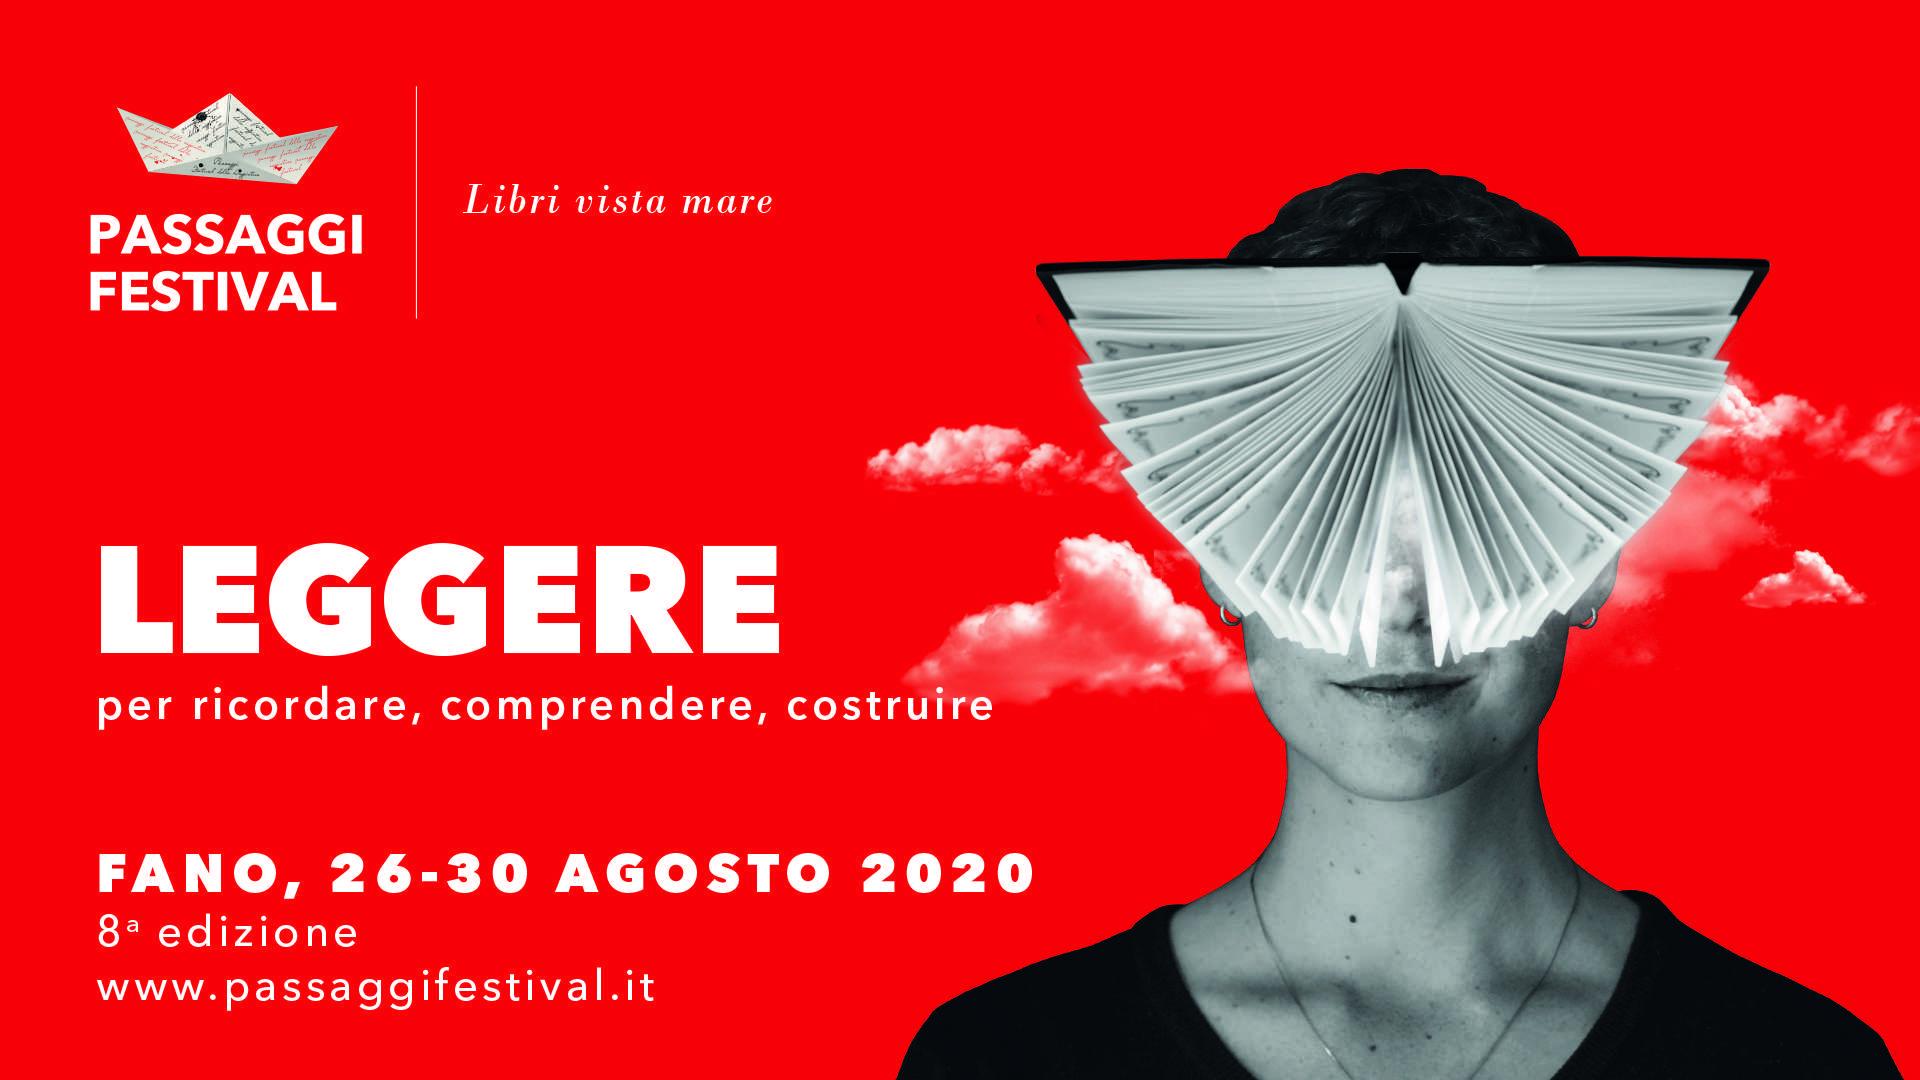 Passaggi Festival 2020 immagine desktop 1920x1080